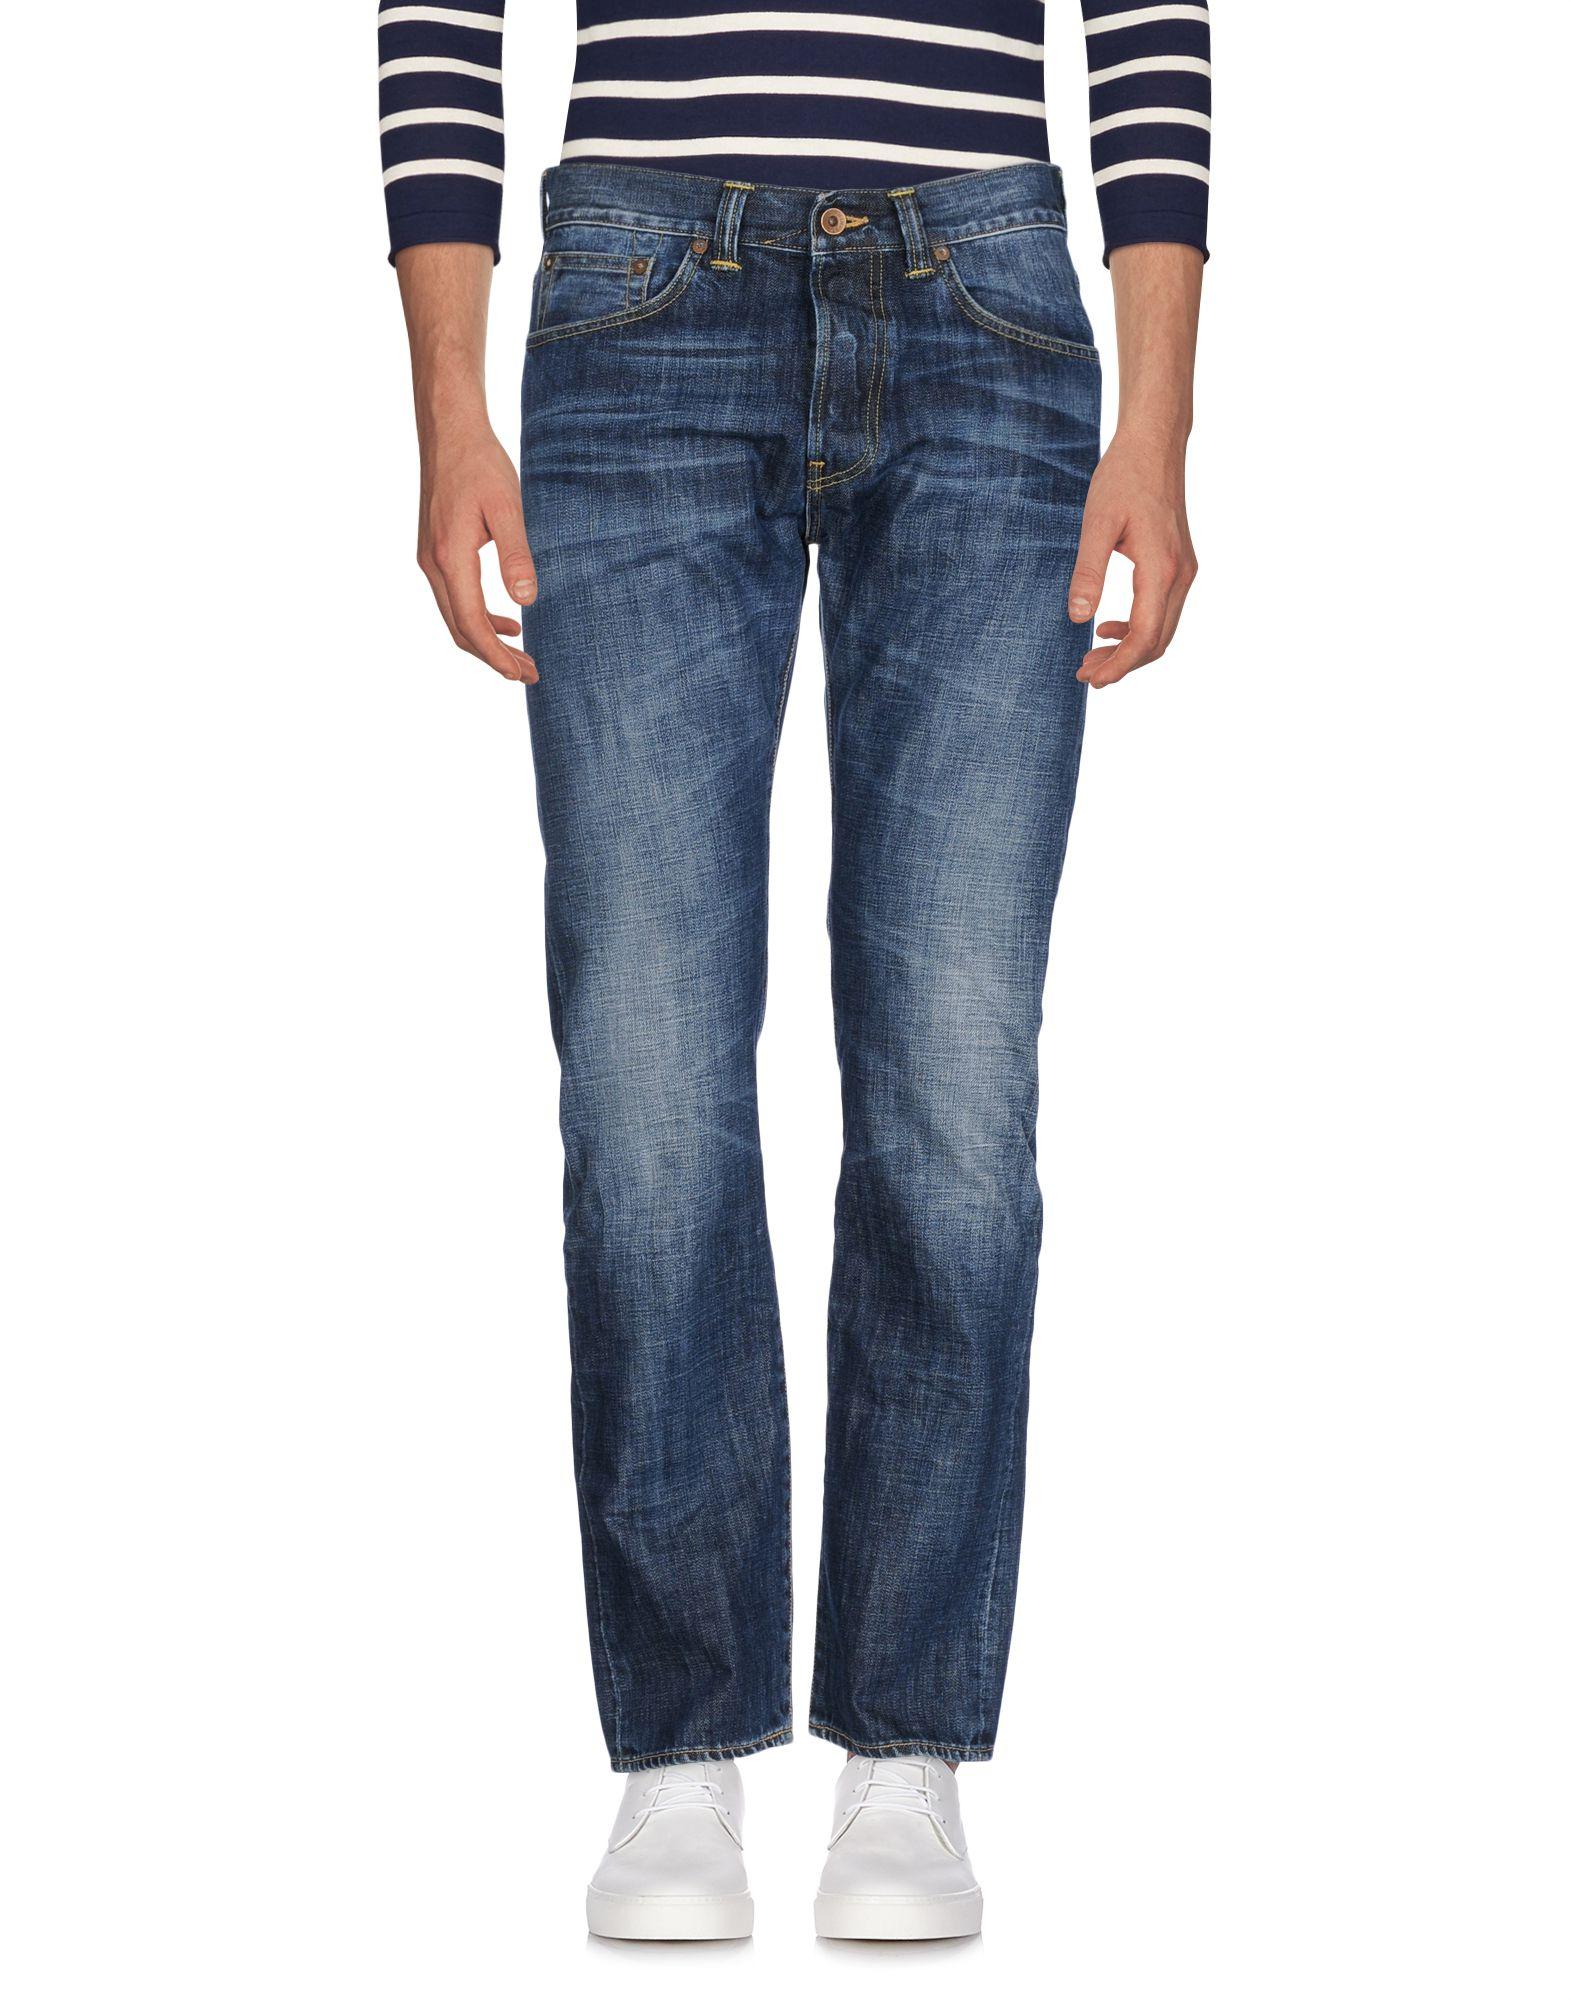 Pantaloni Jeans Edwin Uomo - Acquista online su